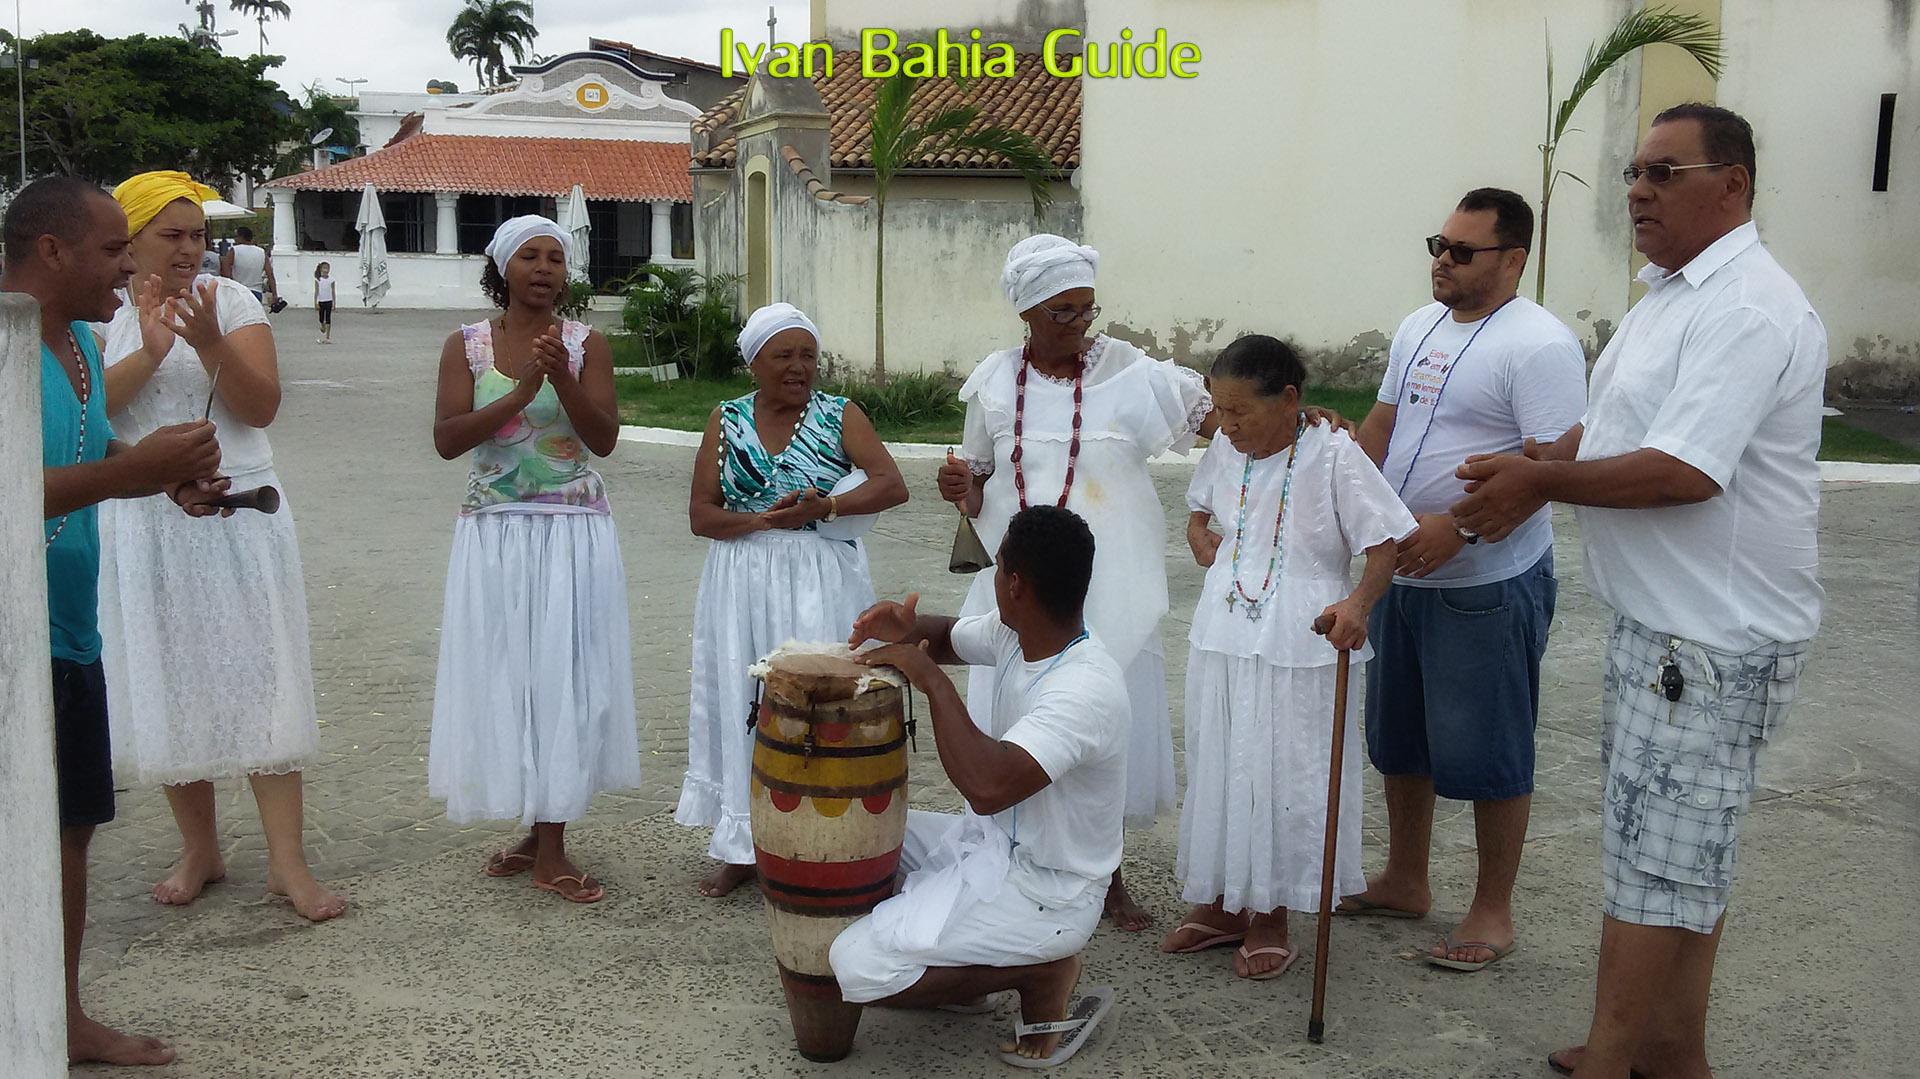 Candomblé offering to the goddess Yemanja in Monte Serrat - with Ivan's Salvador da Bahia & Chapada Diamantiana national park's official tour guide